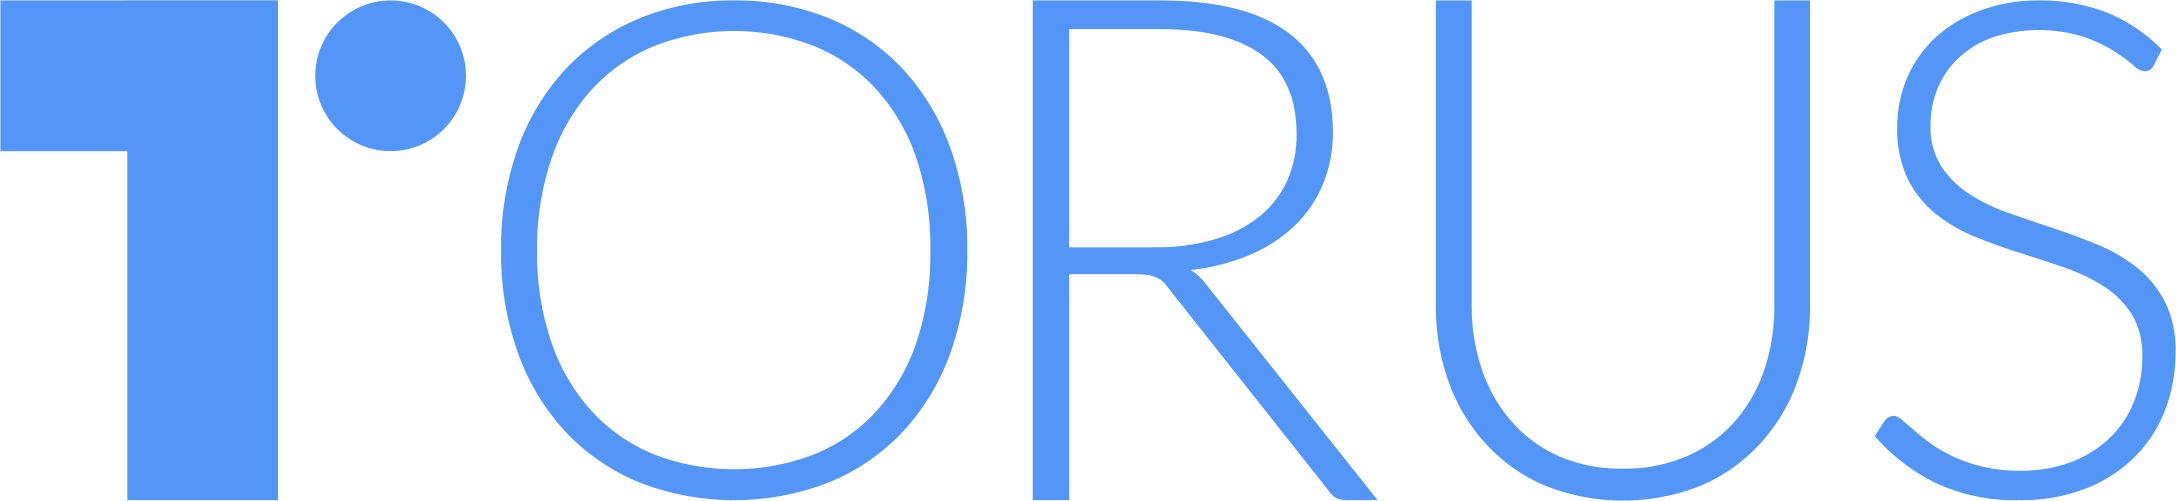 Torus - Xion Global Partner